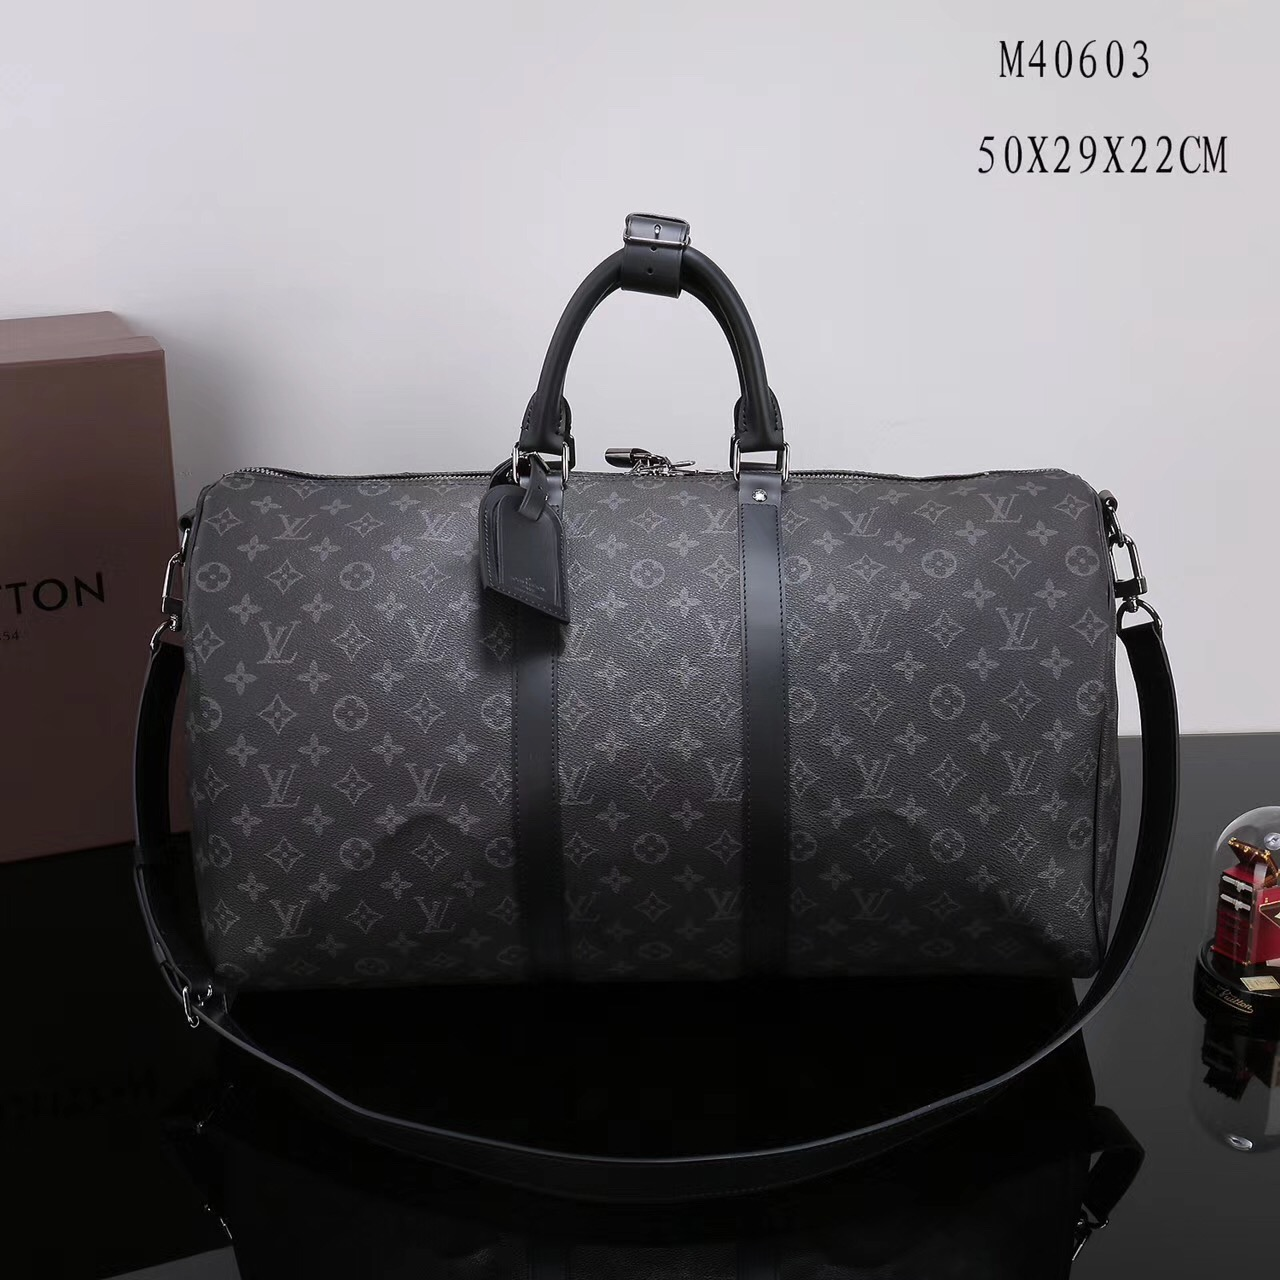 Men Lv Louis Vuitton M40603 Keepall 50